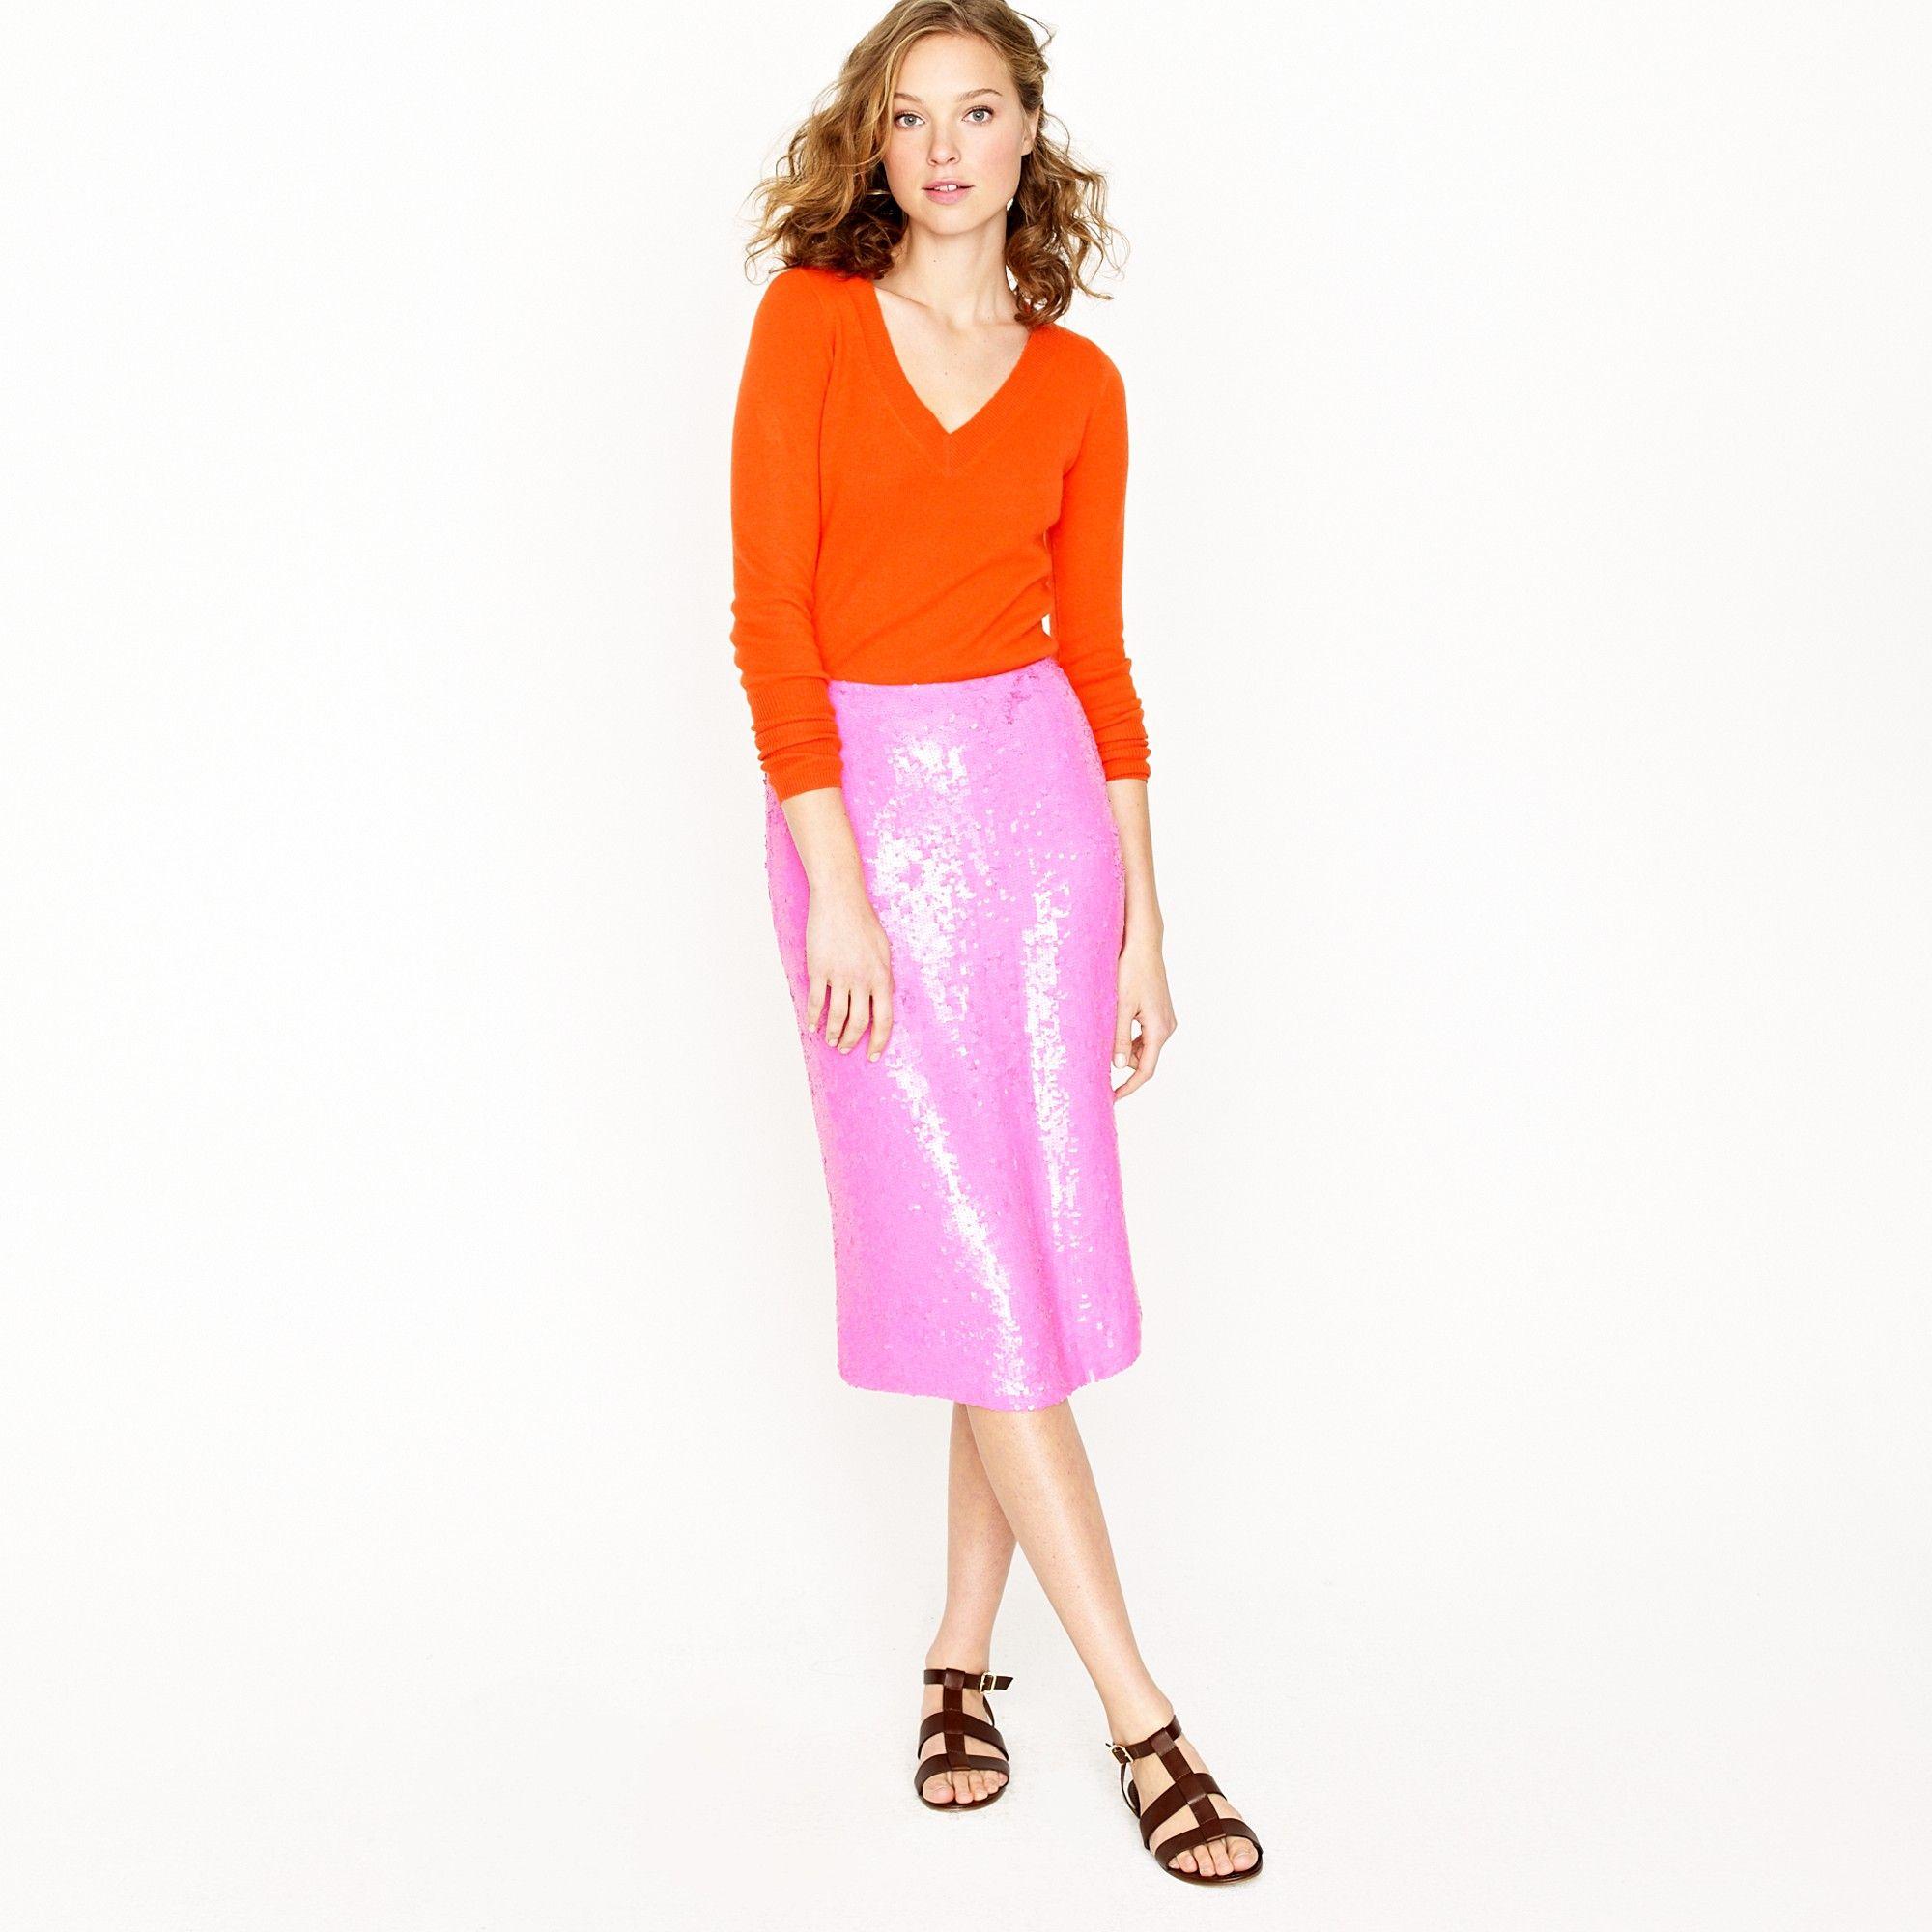 d5e1ba743d3f J.crew No. 2 Pencil Skirt in Sequins in Purple (azalea)